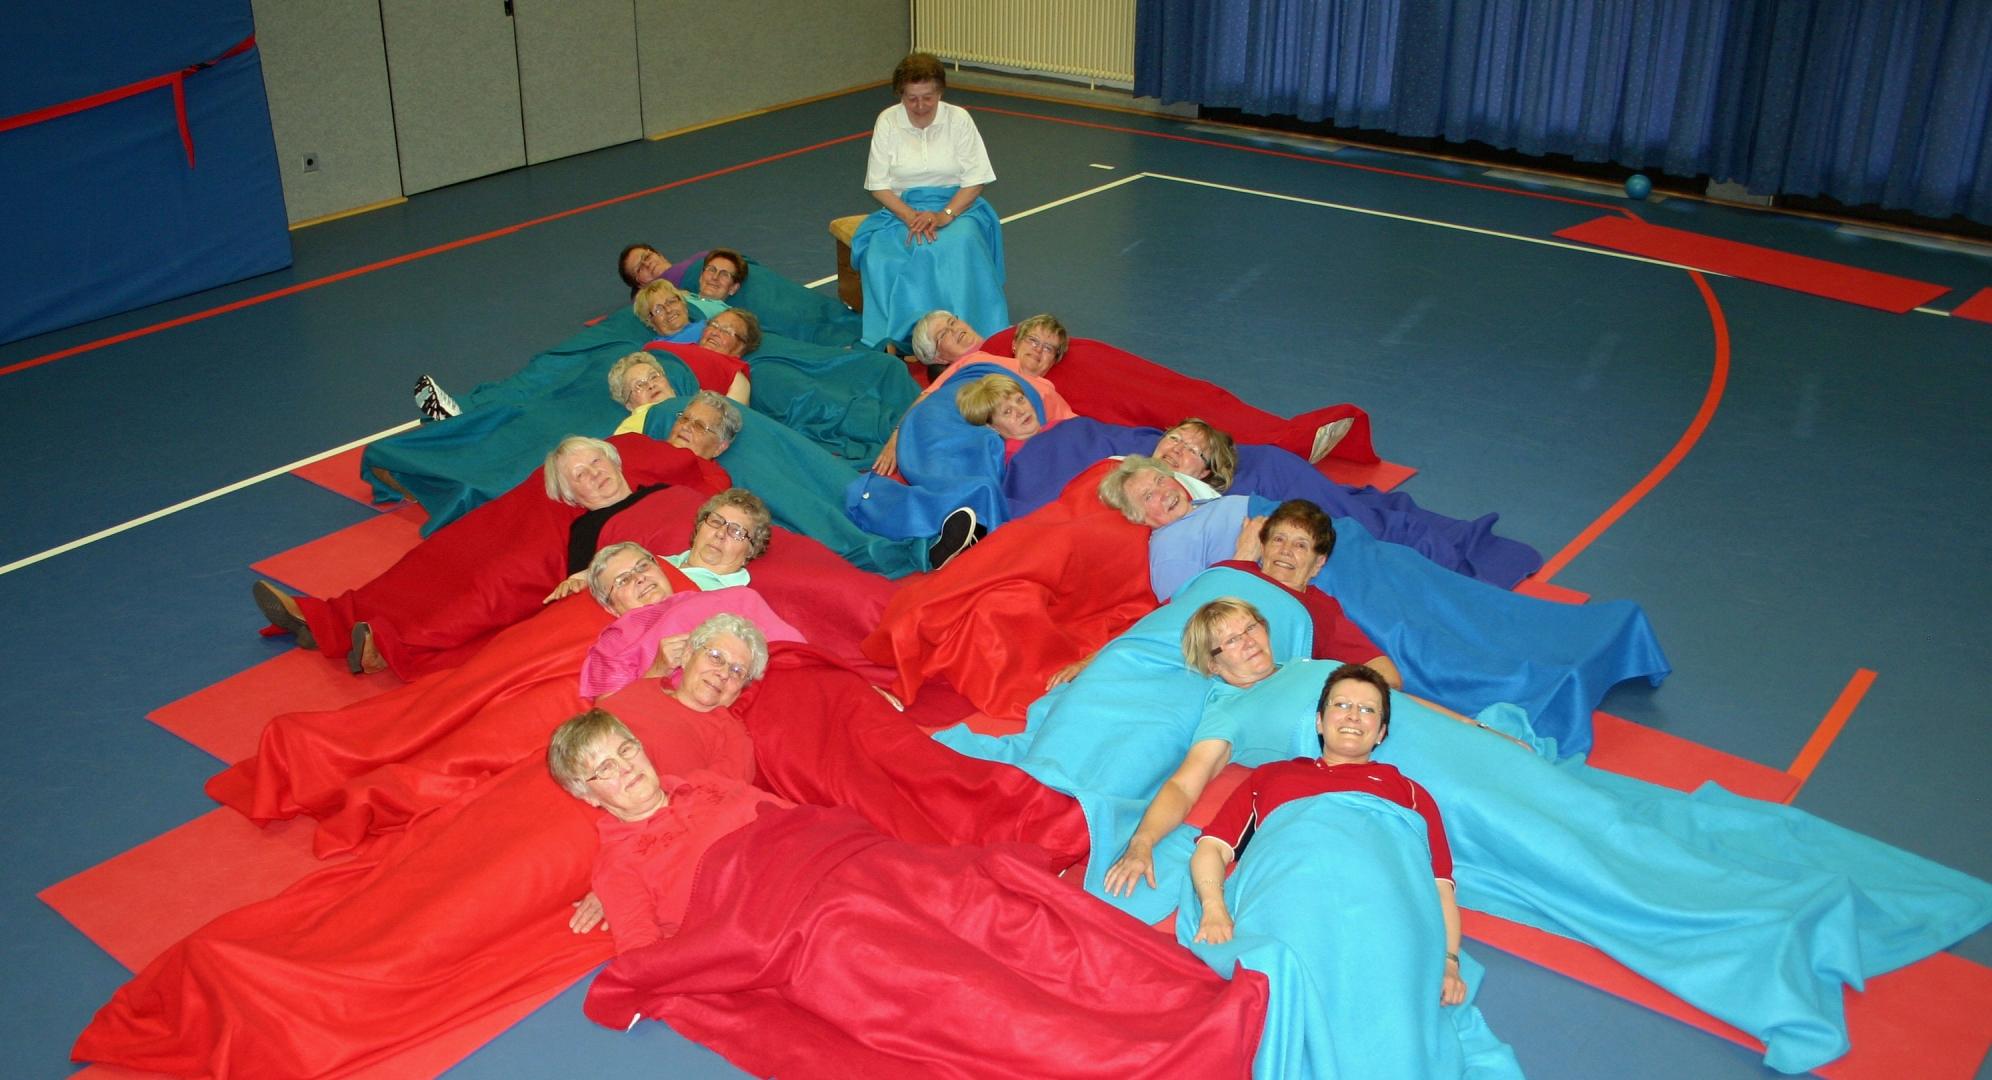 tl_files/bilder/gymn/Seniorinnen/4-Zugedeckt-1.jpg